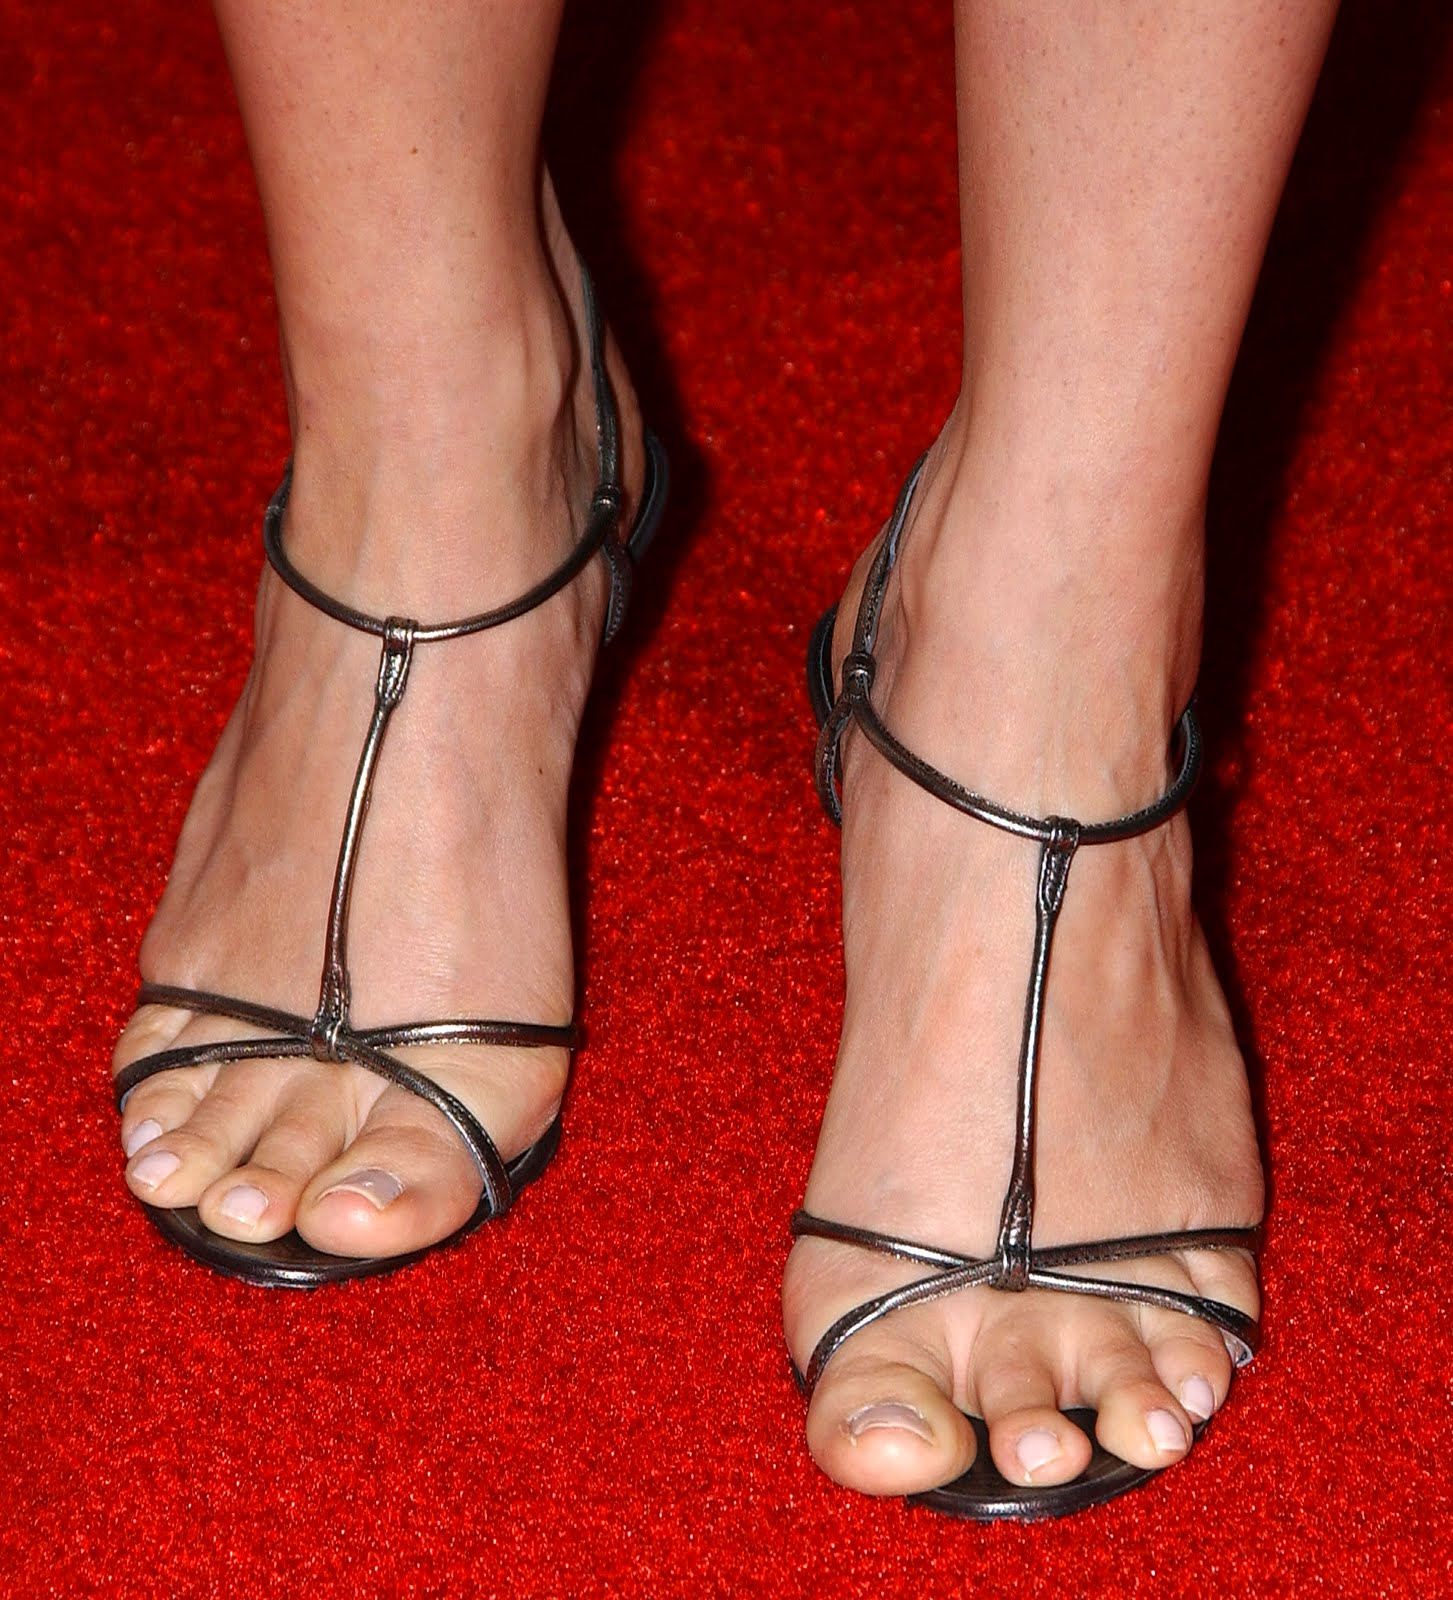 http://4.bp.blogspot.com/_UaLWp72nij4/TAgSPNcBzqI/AAAAAAAANqI/arzD_TrHt6U/s1600/megyn-price-feet.jpg